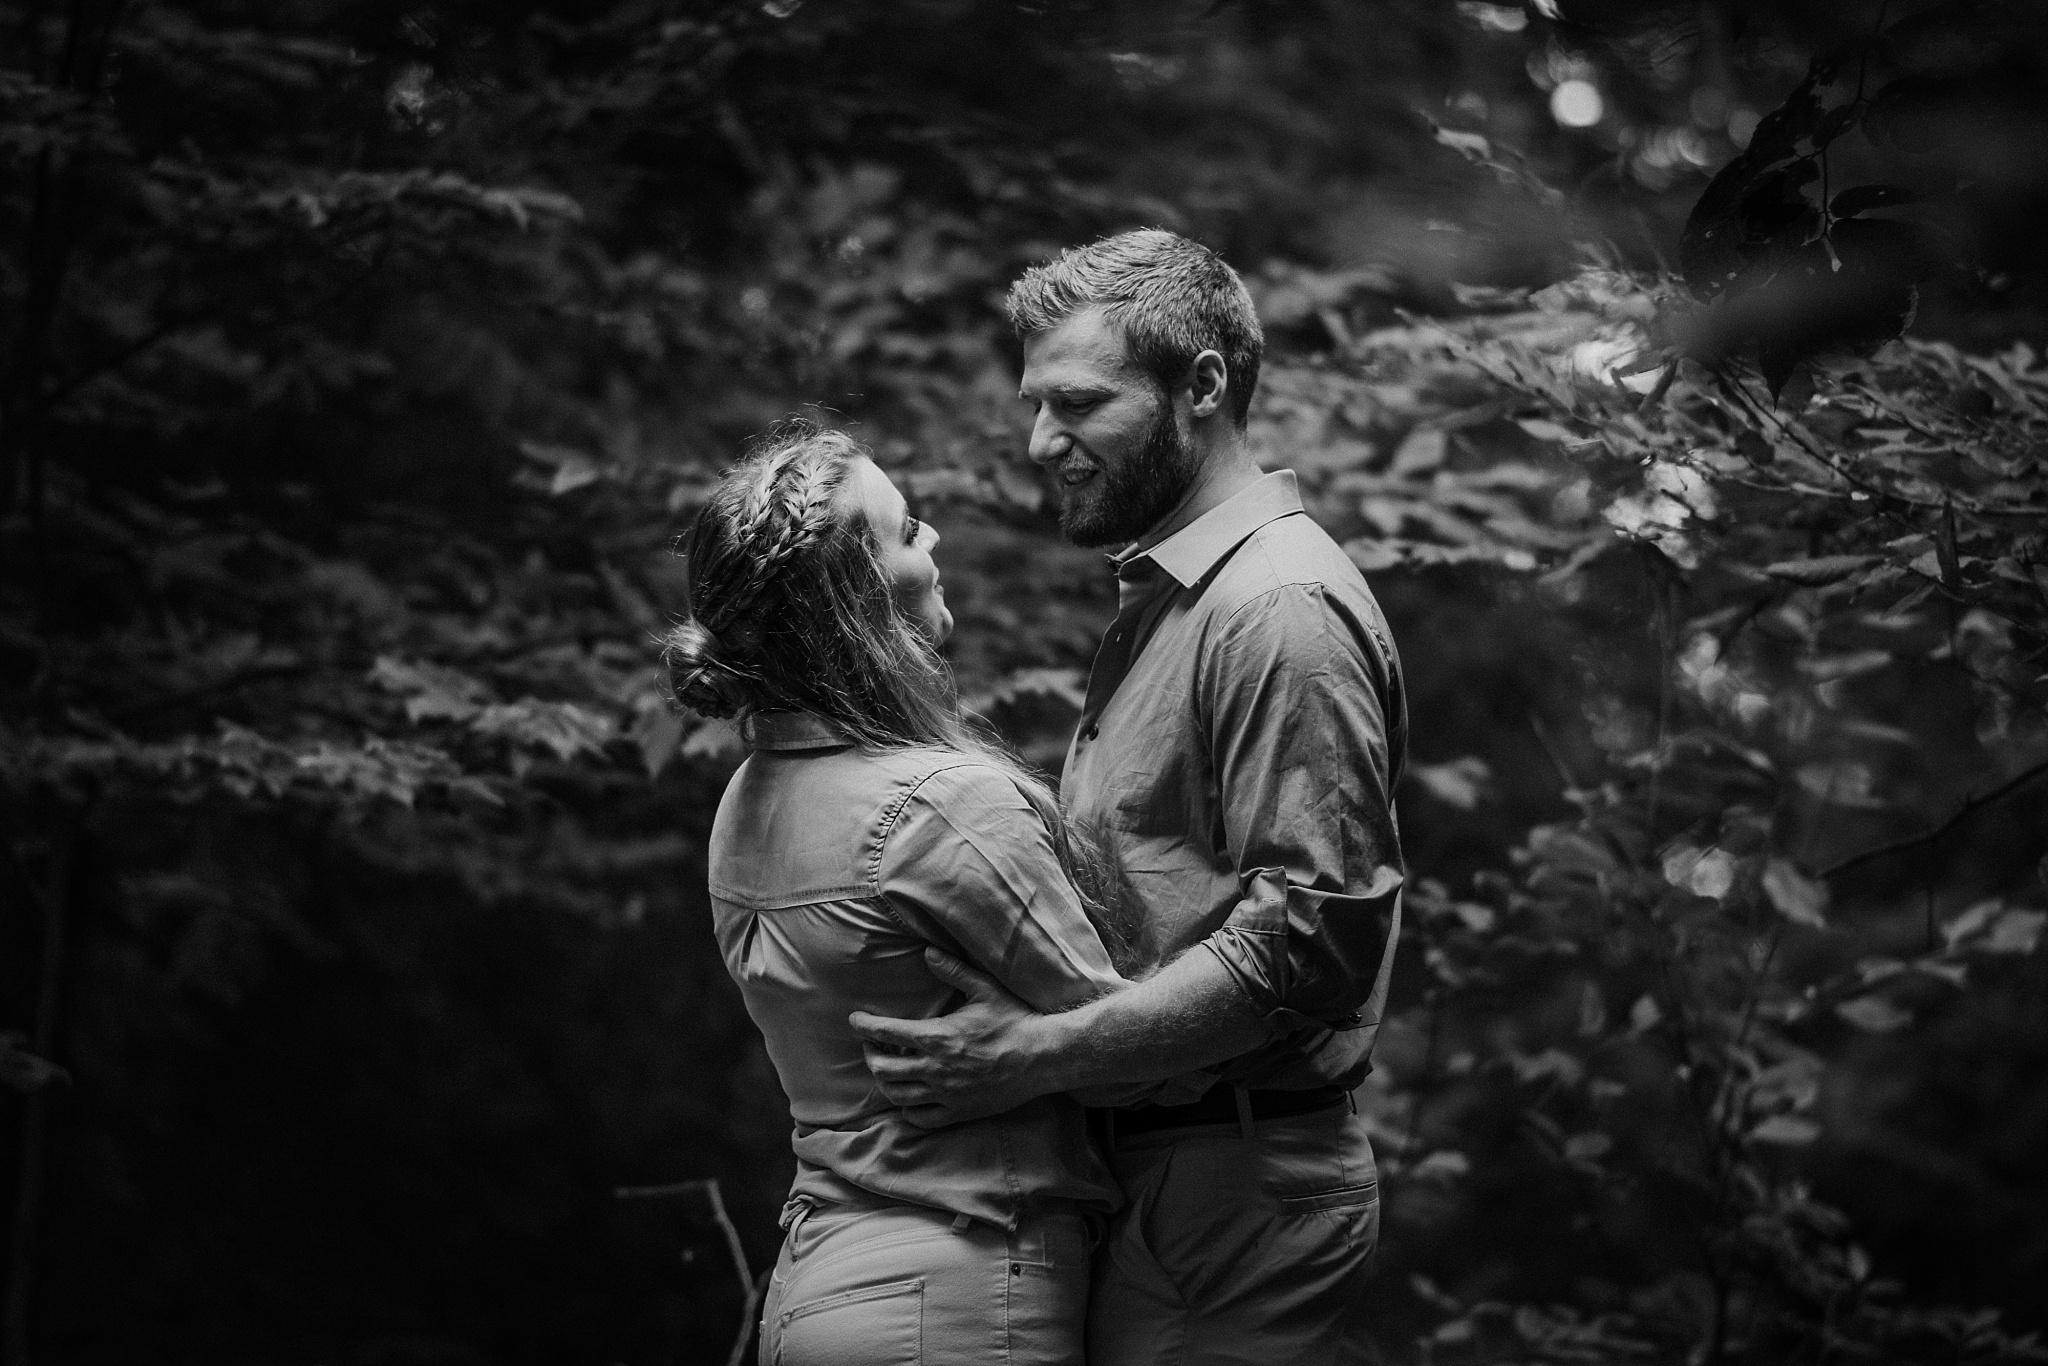 Northern-Michigan-Photographer,Northern-Michigan-Photographer-Sunset-Engagement-Photo-Shoot-Old-Mission-Peninsula-Lighthouse-Traverse-City-Michigan-Northern-MI-Wedding-Photography,